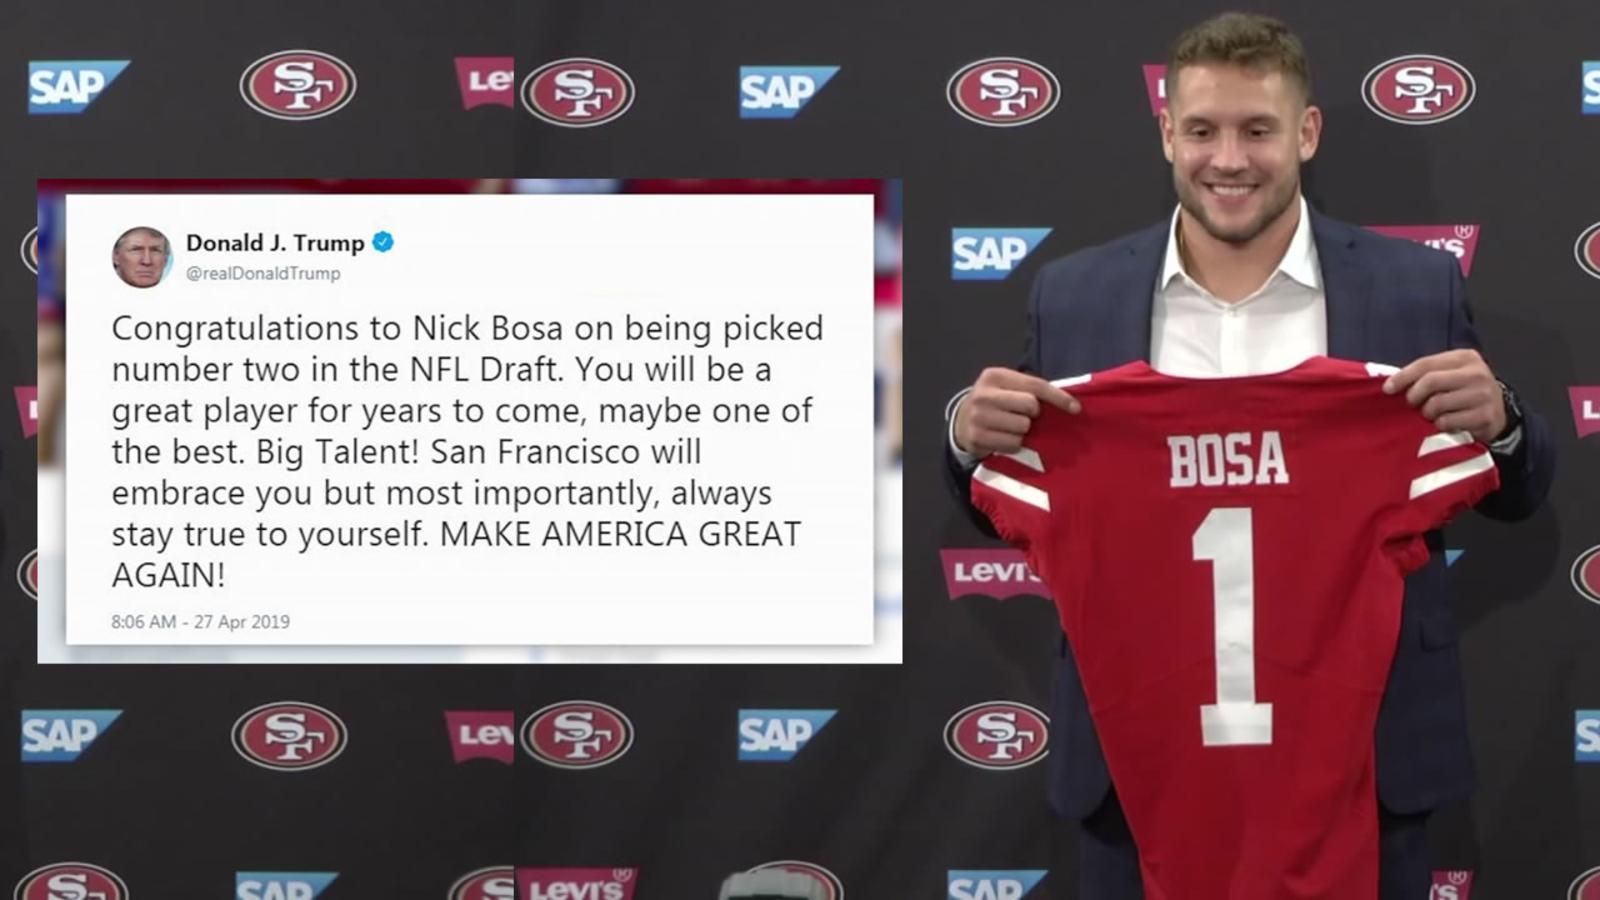 f7732c96c President Trump congratulates San Francisco 49ers draft pick Nick Bosa in  MAGA tweet